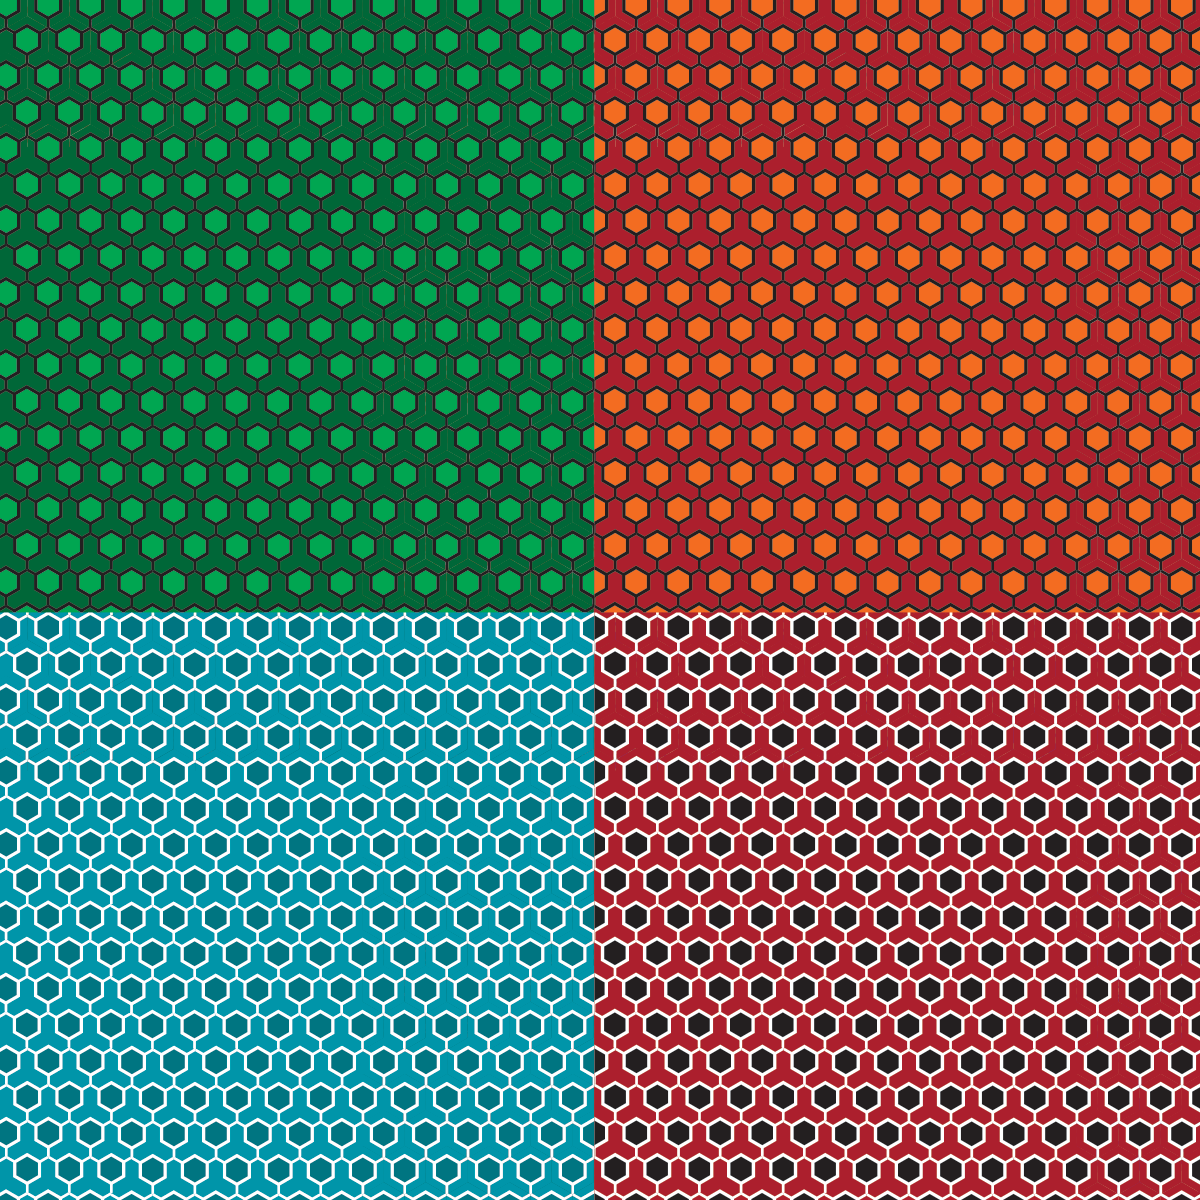 Pattern 42